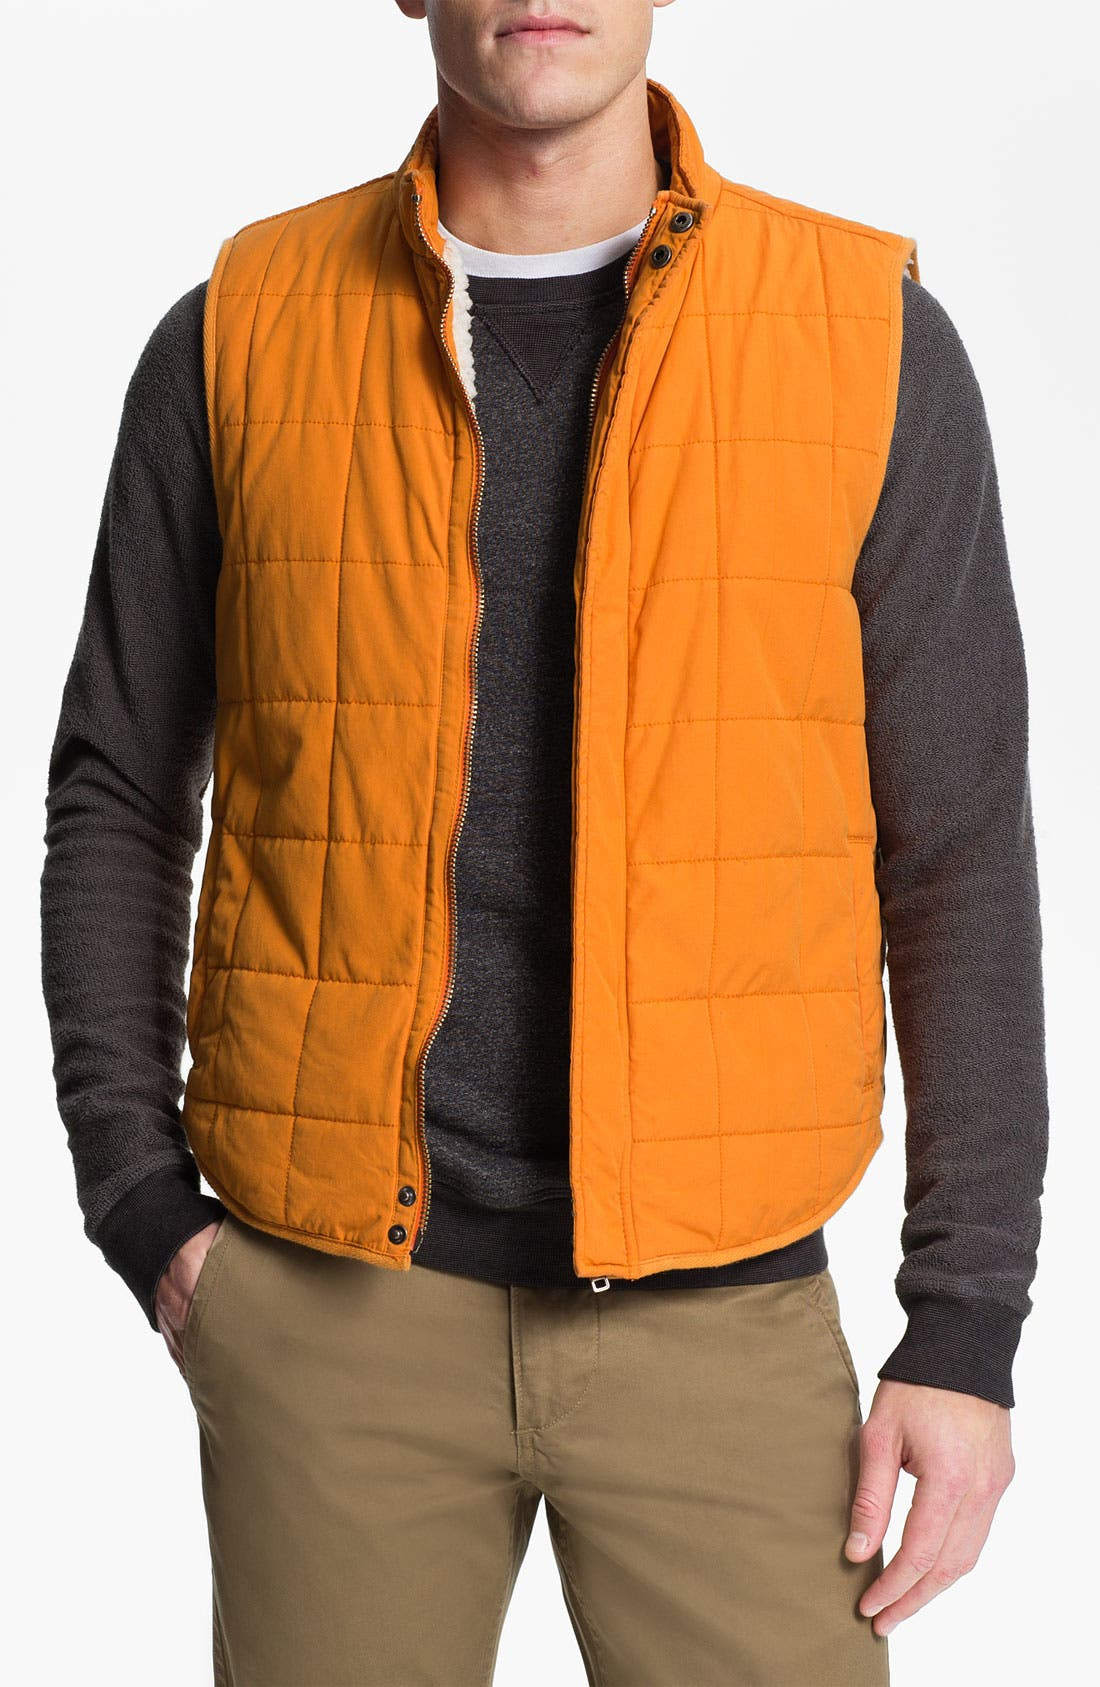 Main Image - Splendid Mills 'Wilson' Quilted Cotton Vest